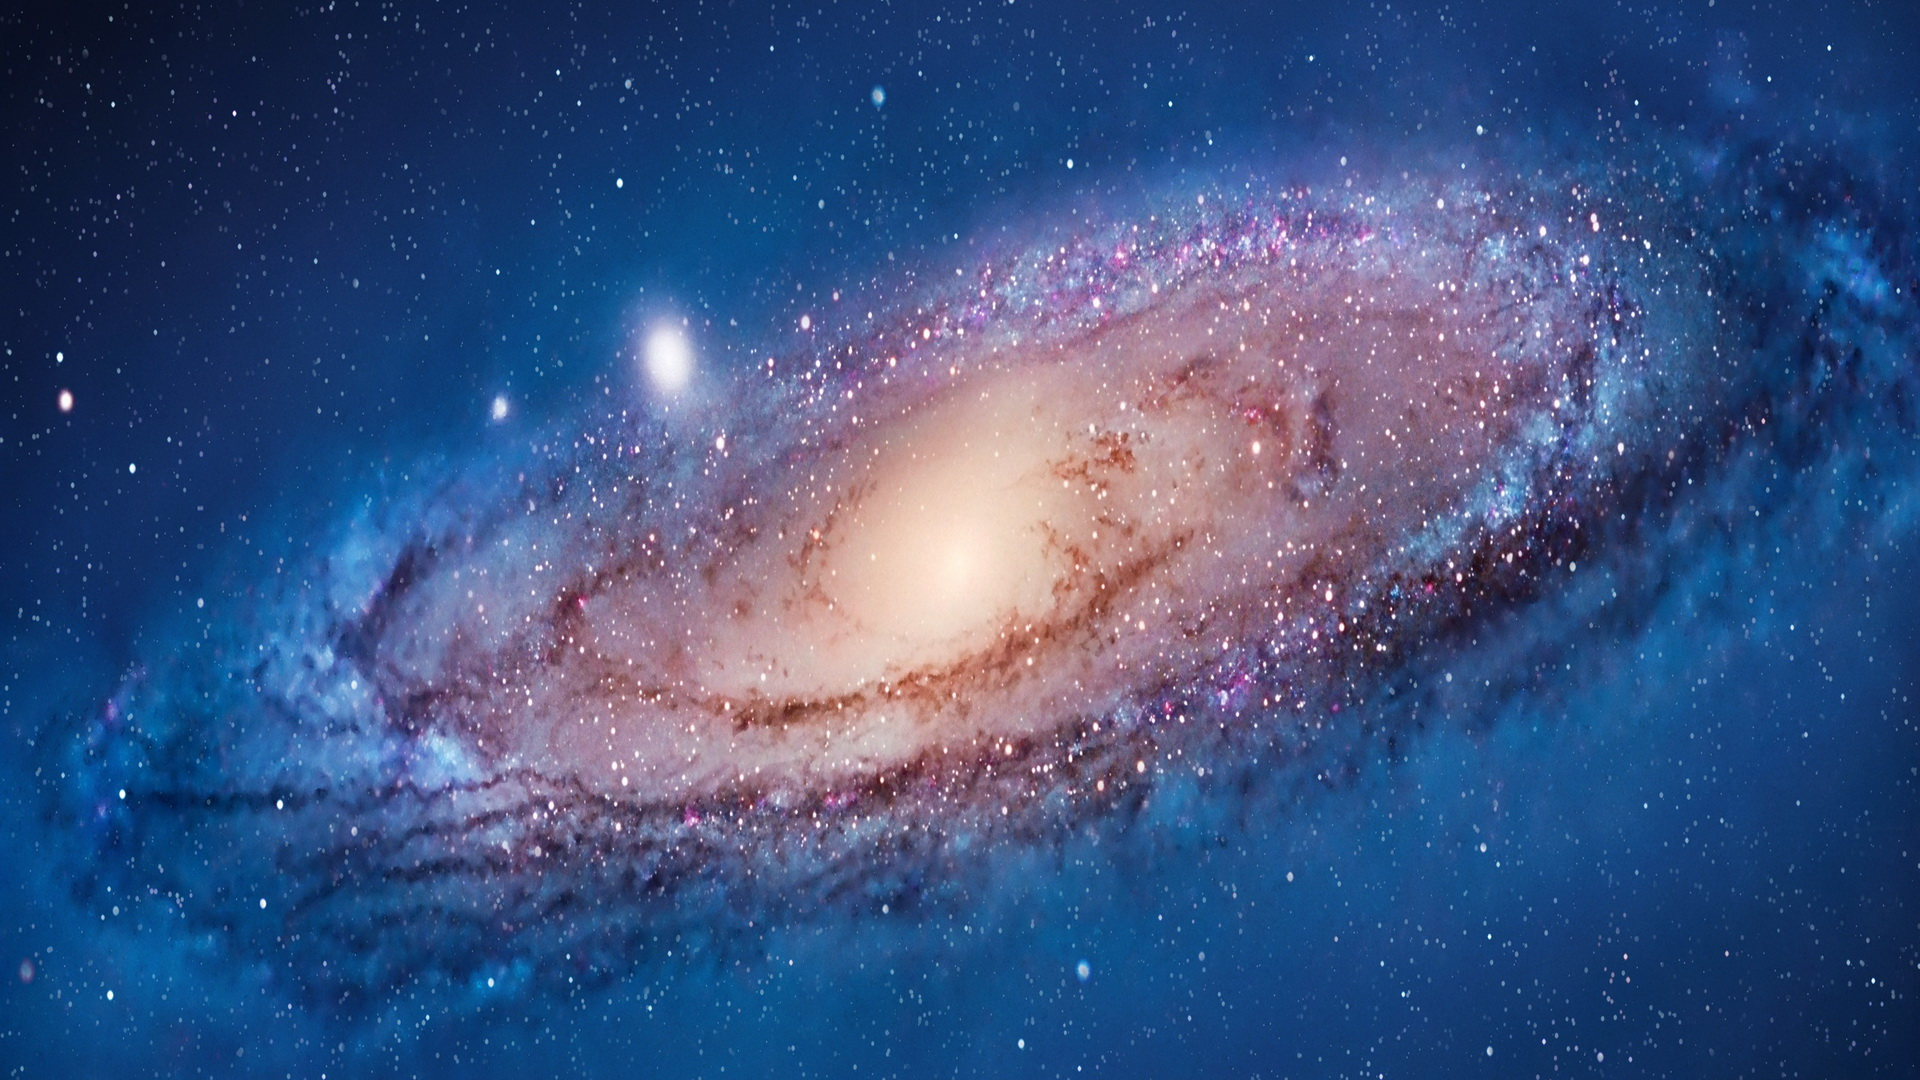 Galaxy Wallpaper Apple #27317 Wallpaper | High Resolution